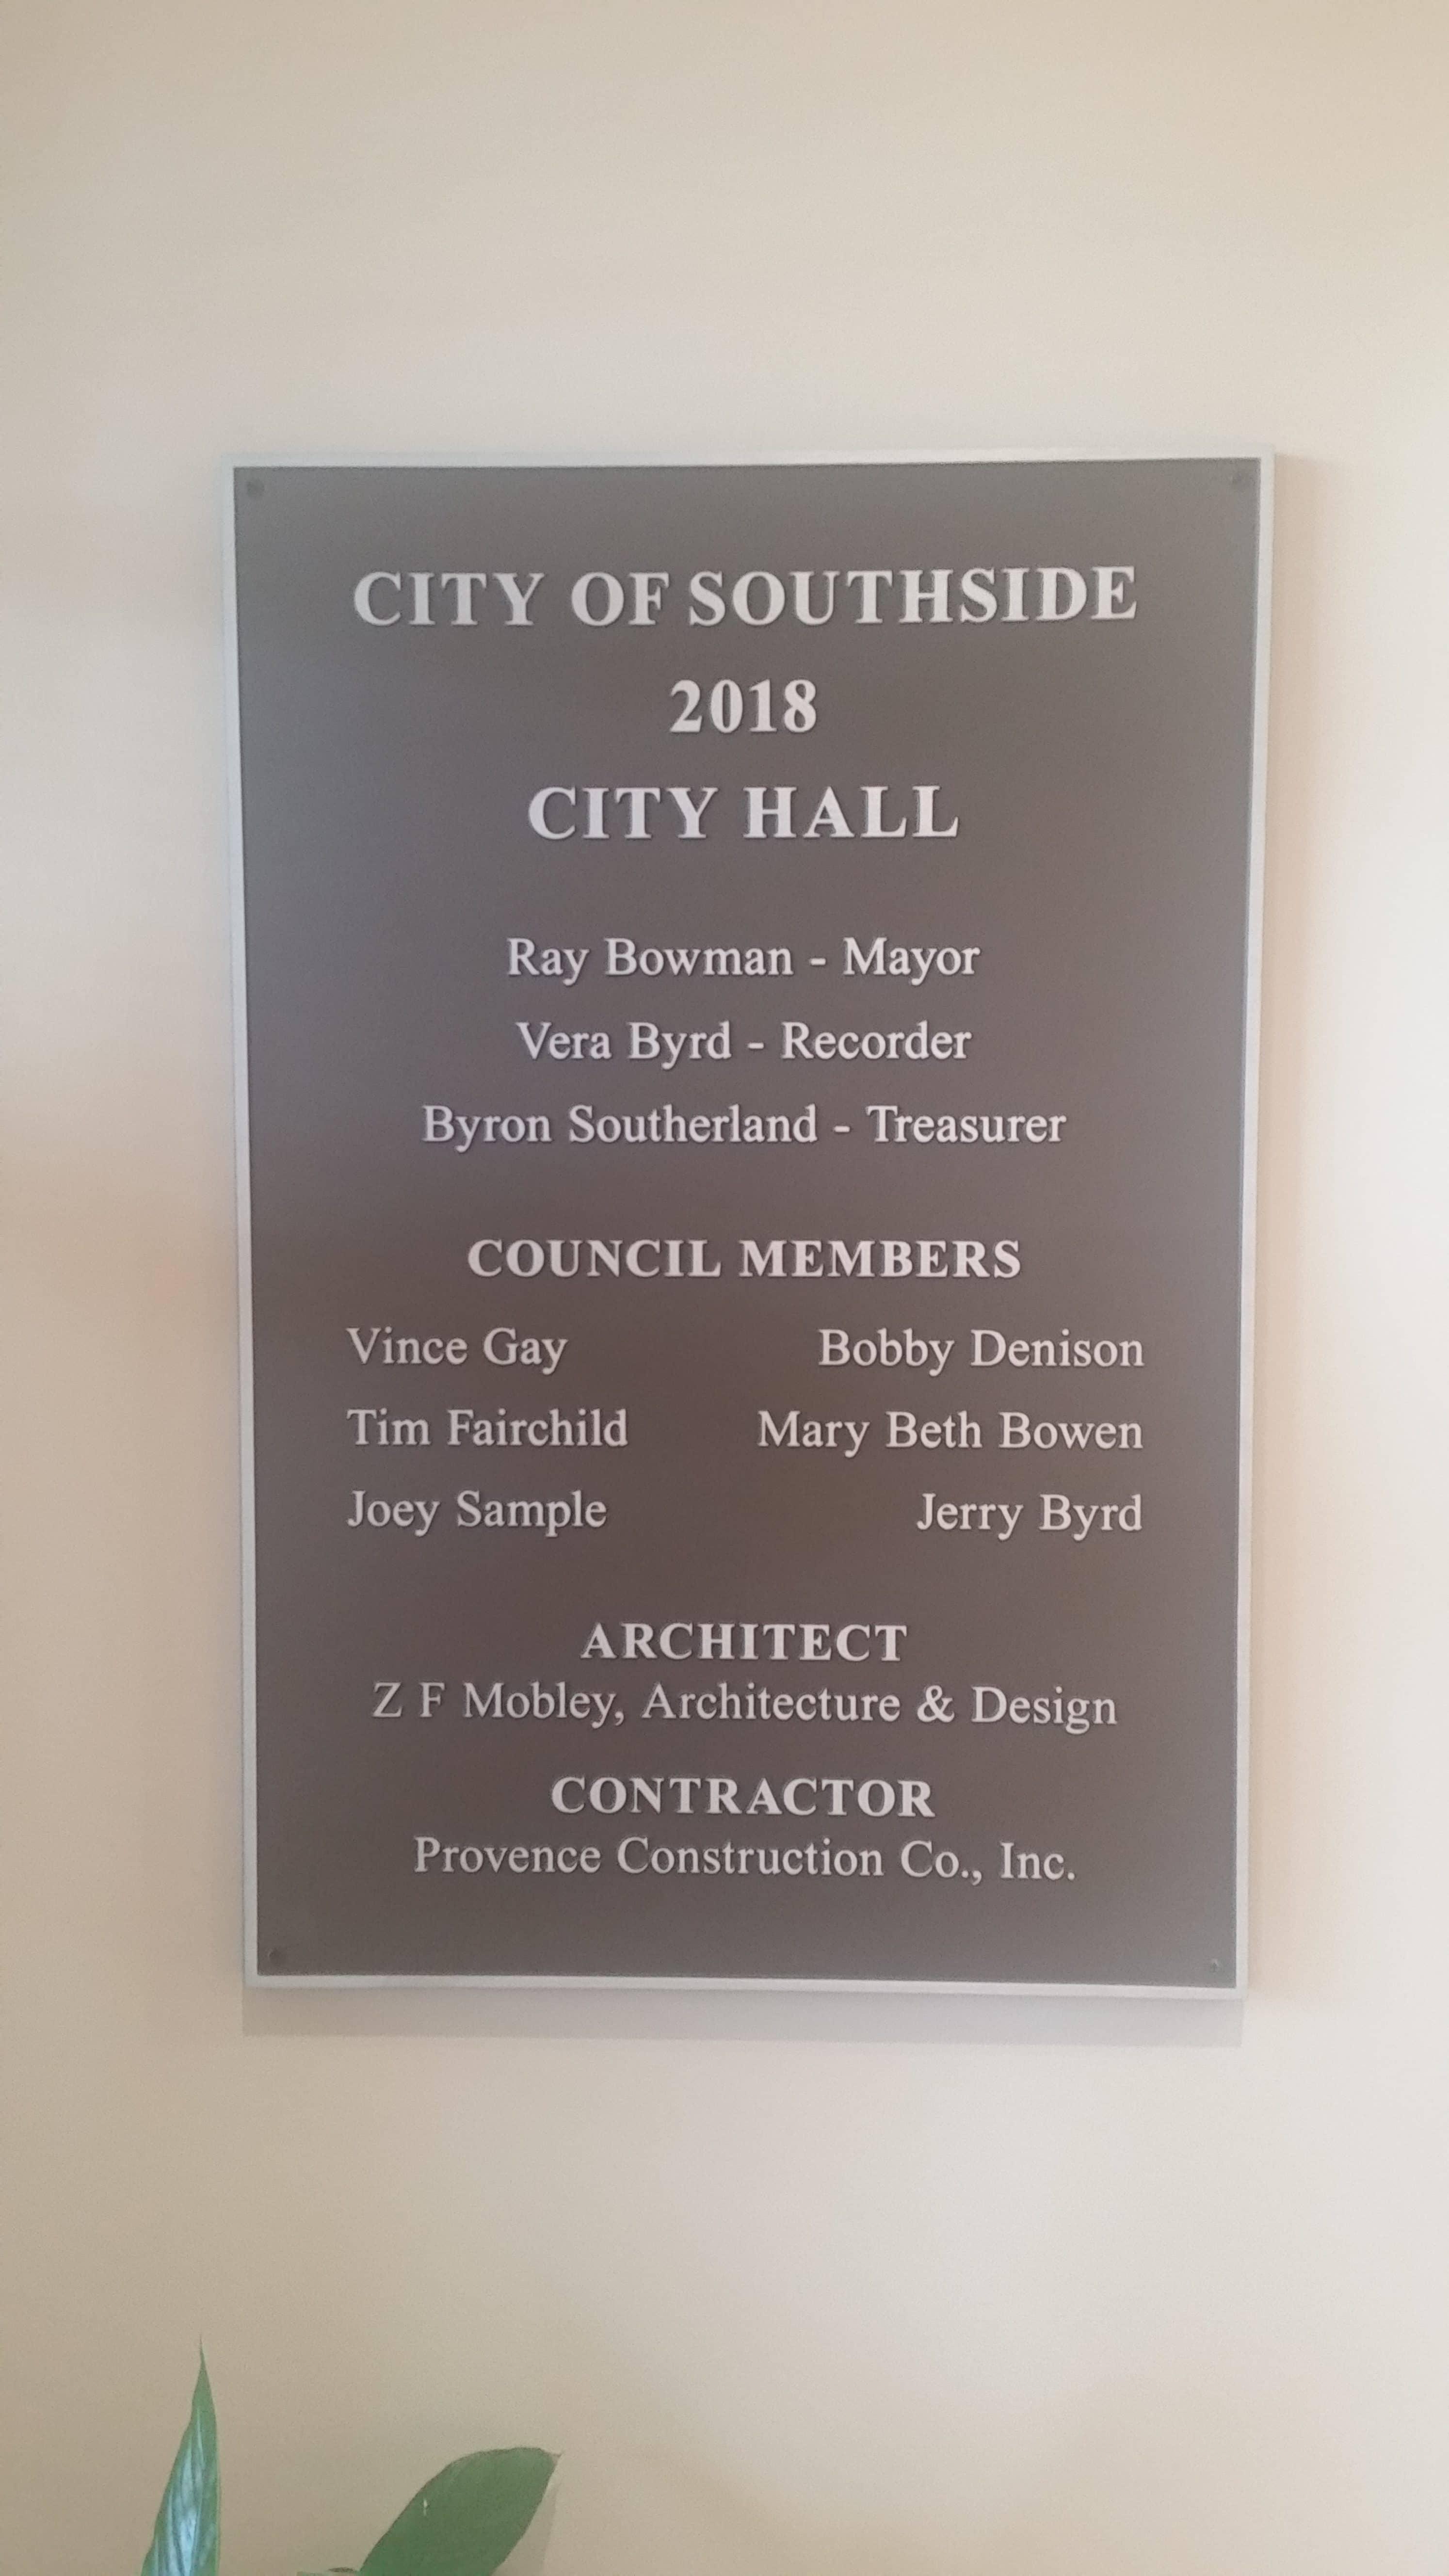 Southside City Hall plaque